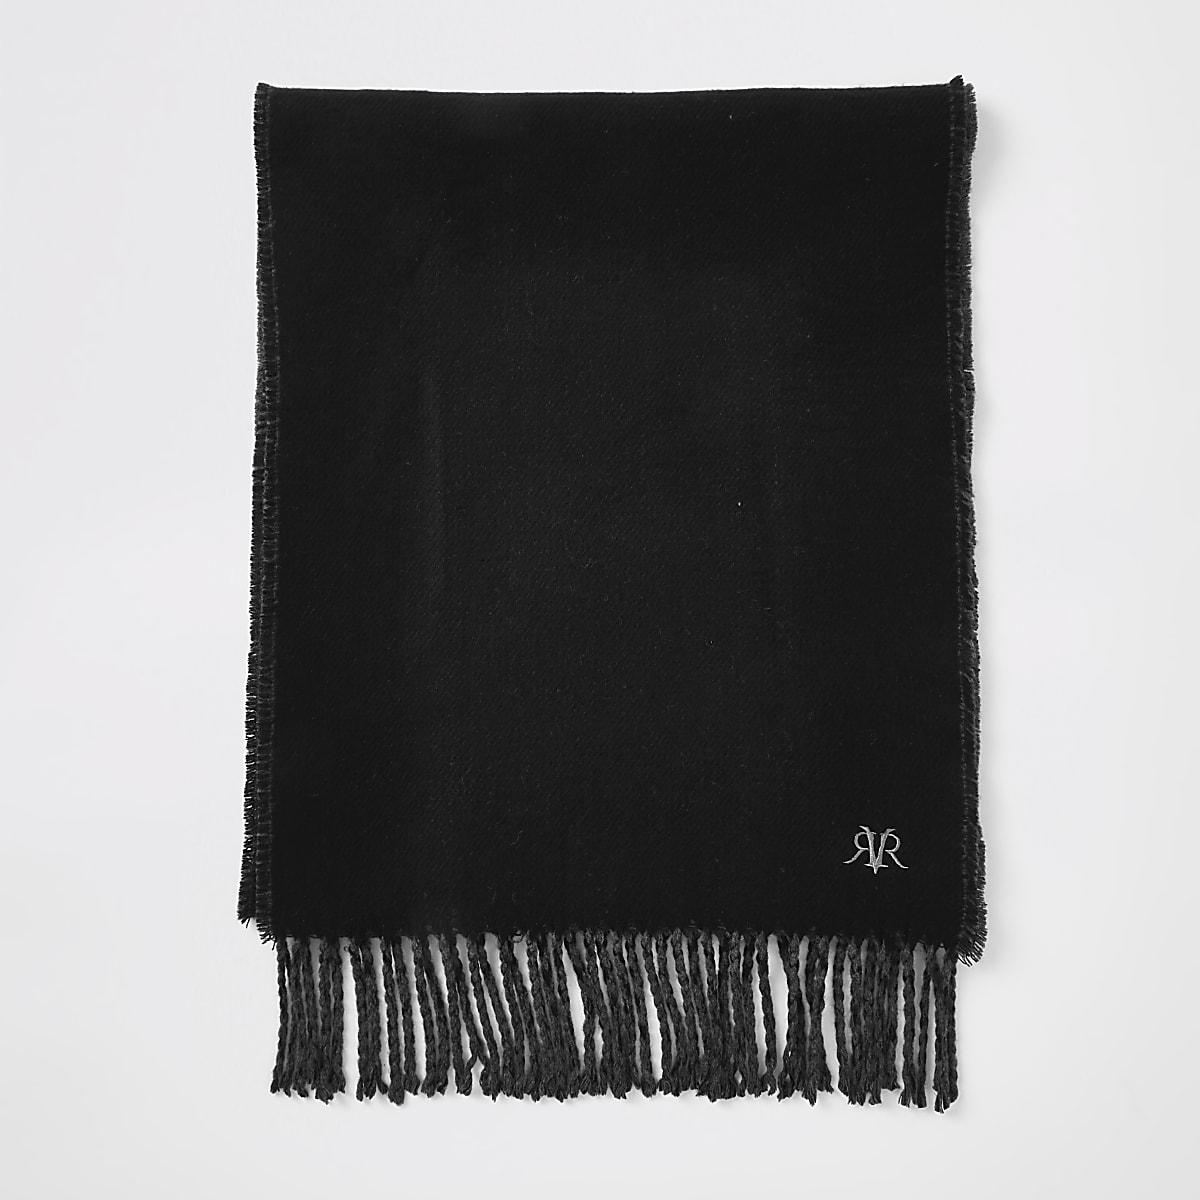 Black RVR embroidered scarf